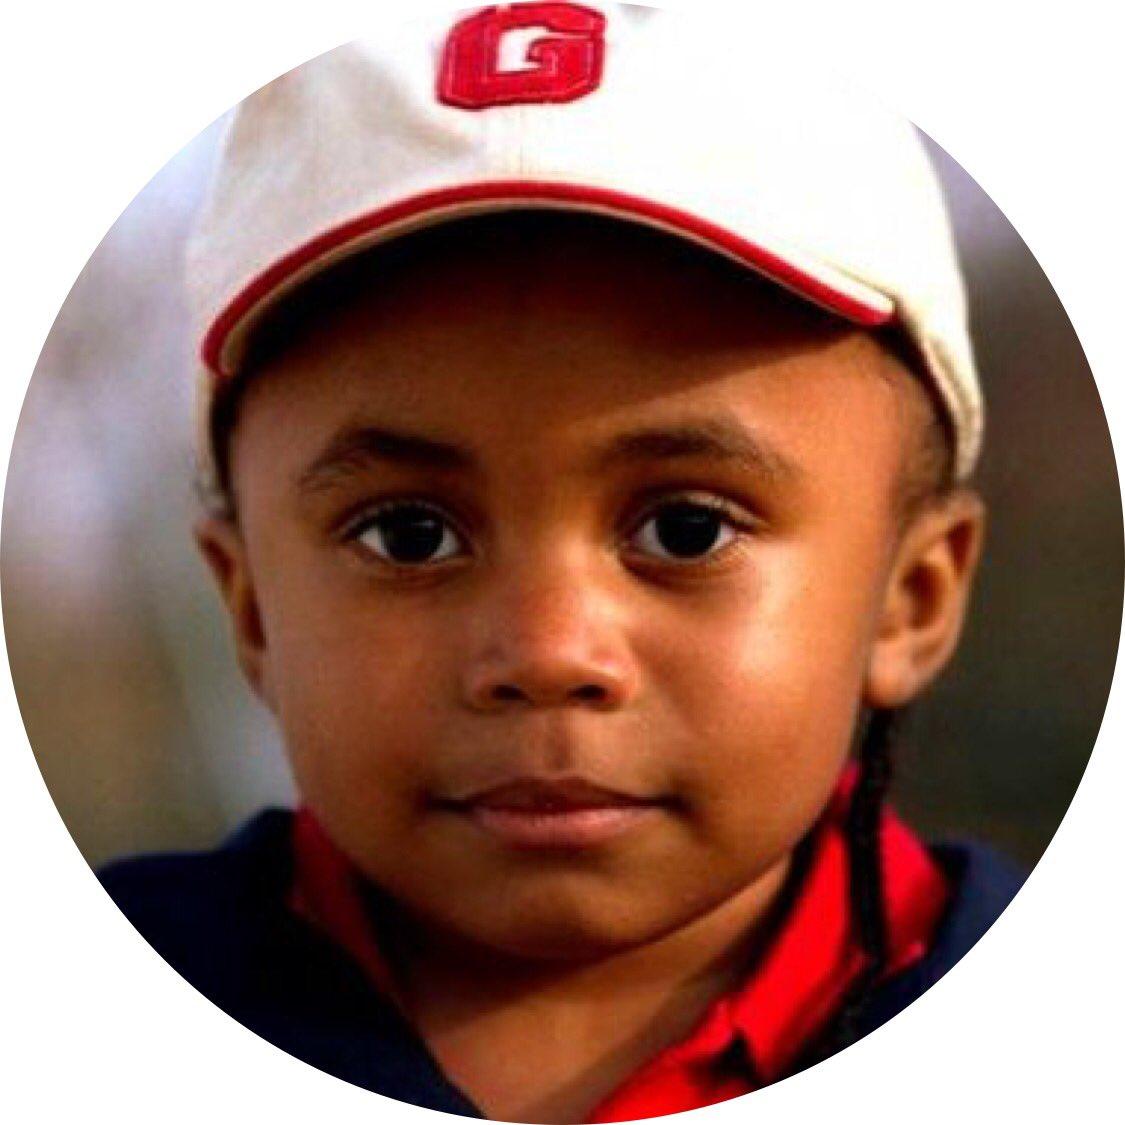 Deji On Twitter My Child Marshall